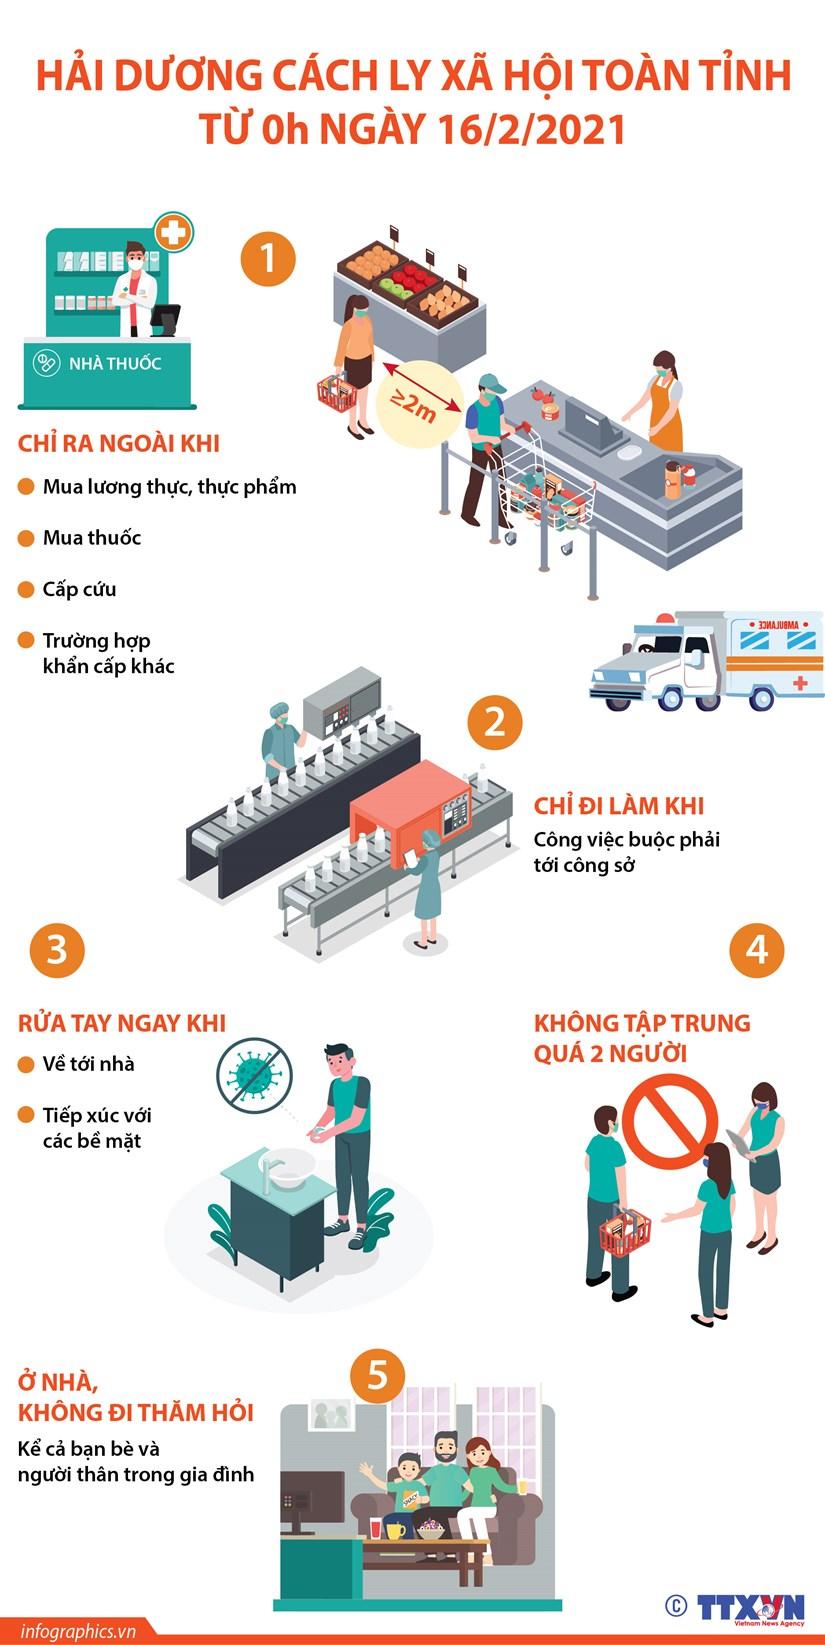 [Infographics] Hai Duong cach ly xa hoi toan tinh tu 0h ngay 16/2/2021 hinh anh 1